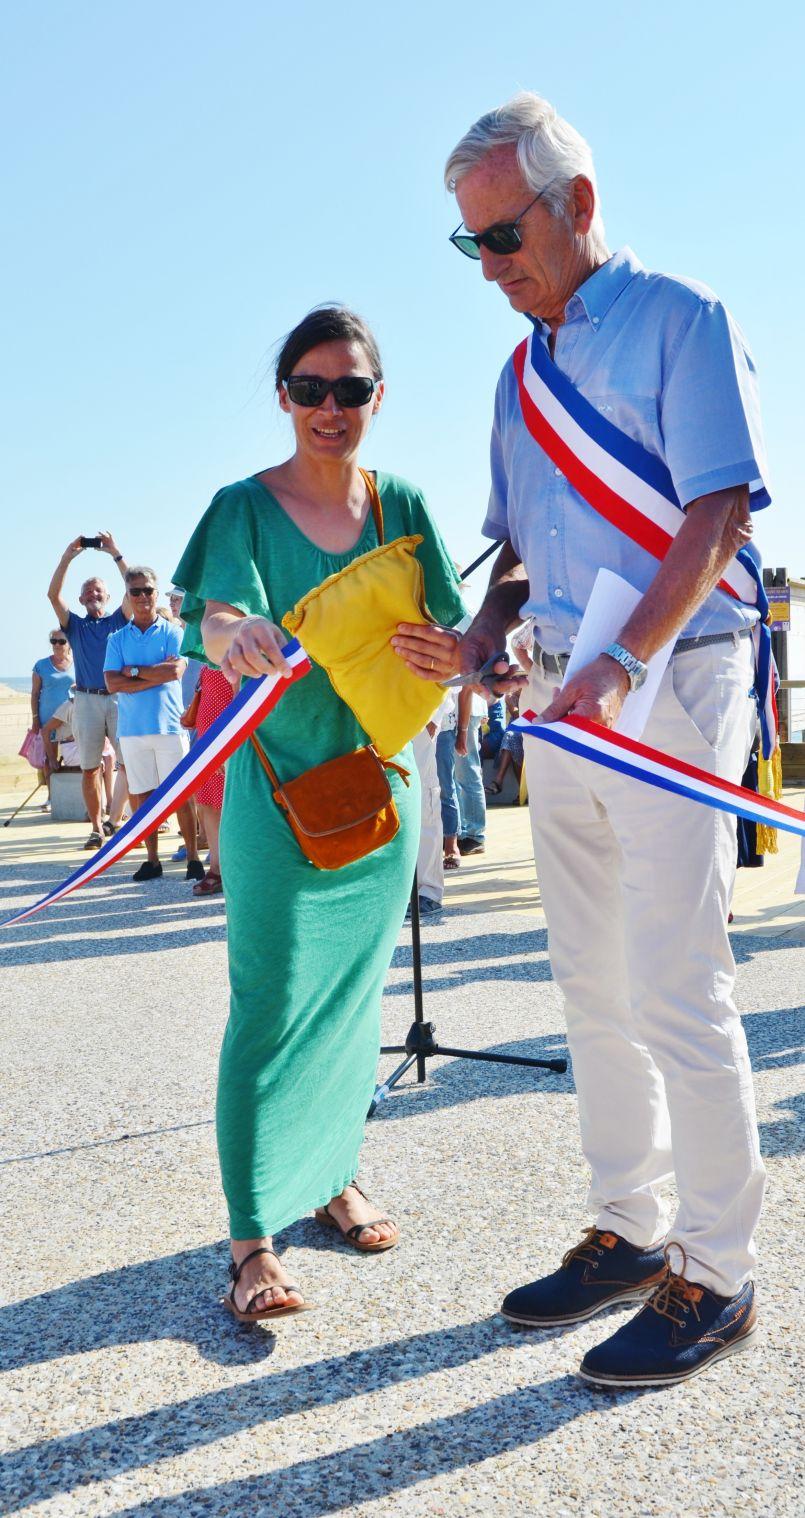 Mimizan a réaménagé sa 'Corniche', désormais 'Promenade de l'Océan'